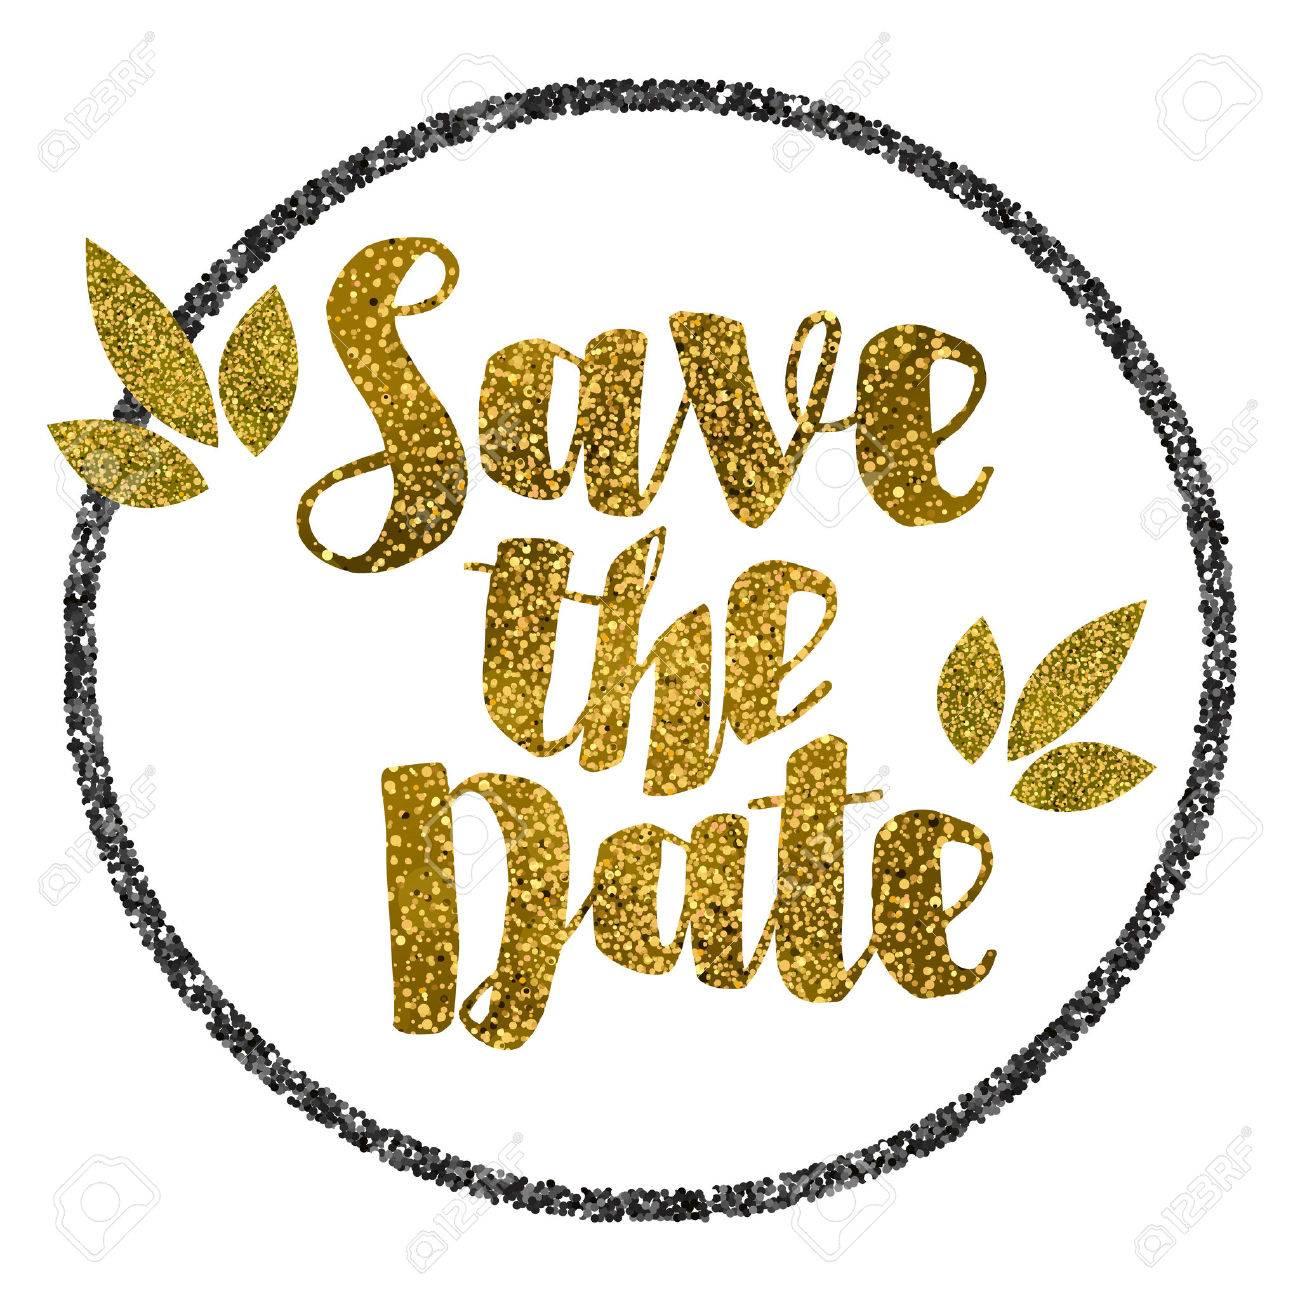 Save the date golden glitter wedding invitation template - 50743808